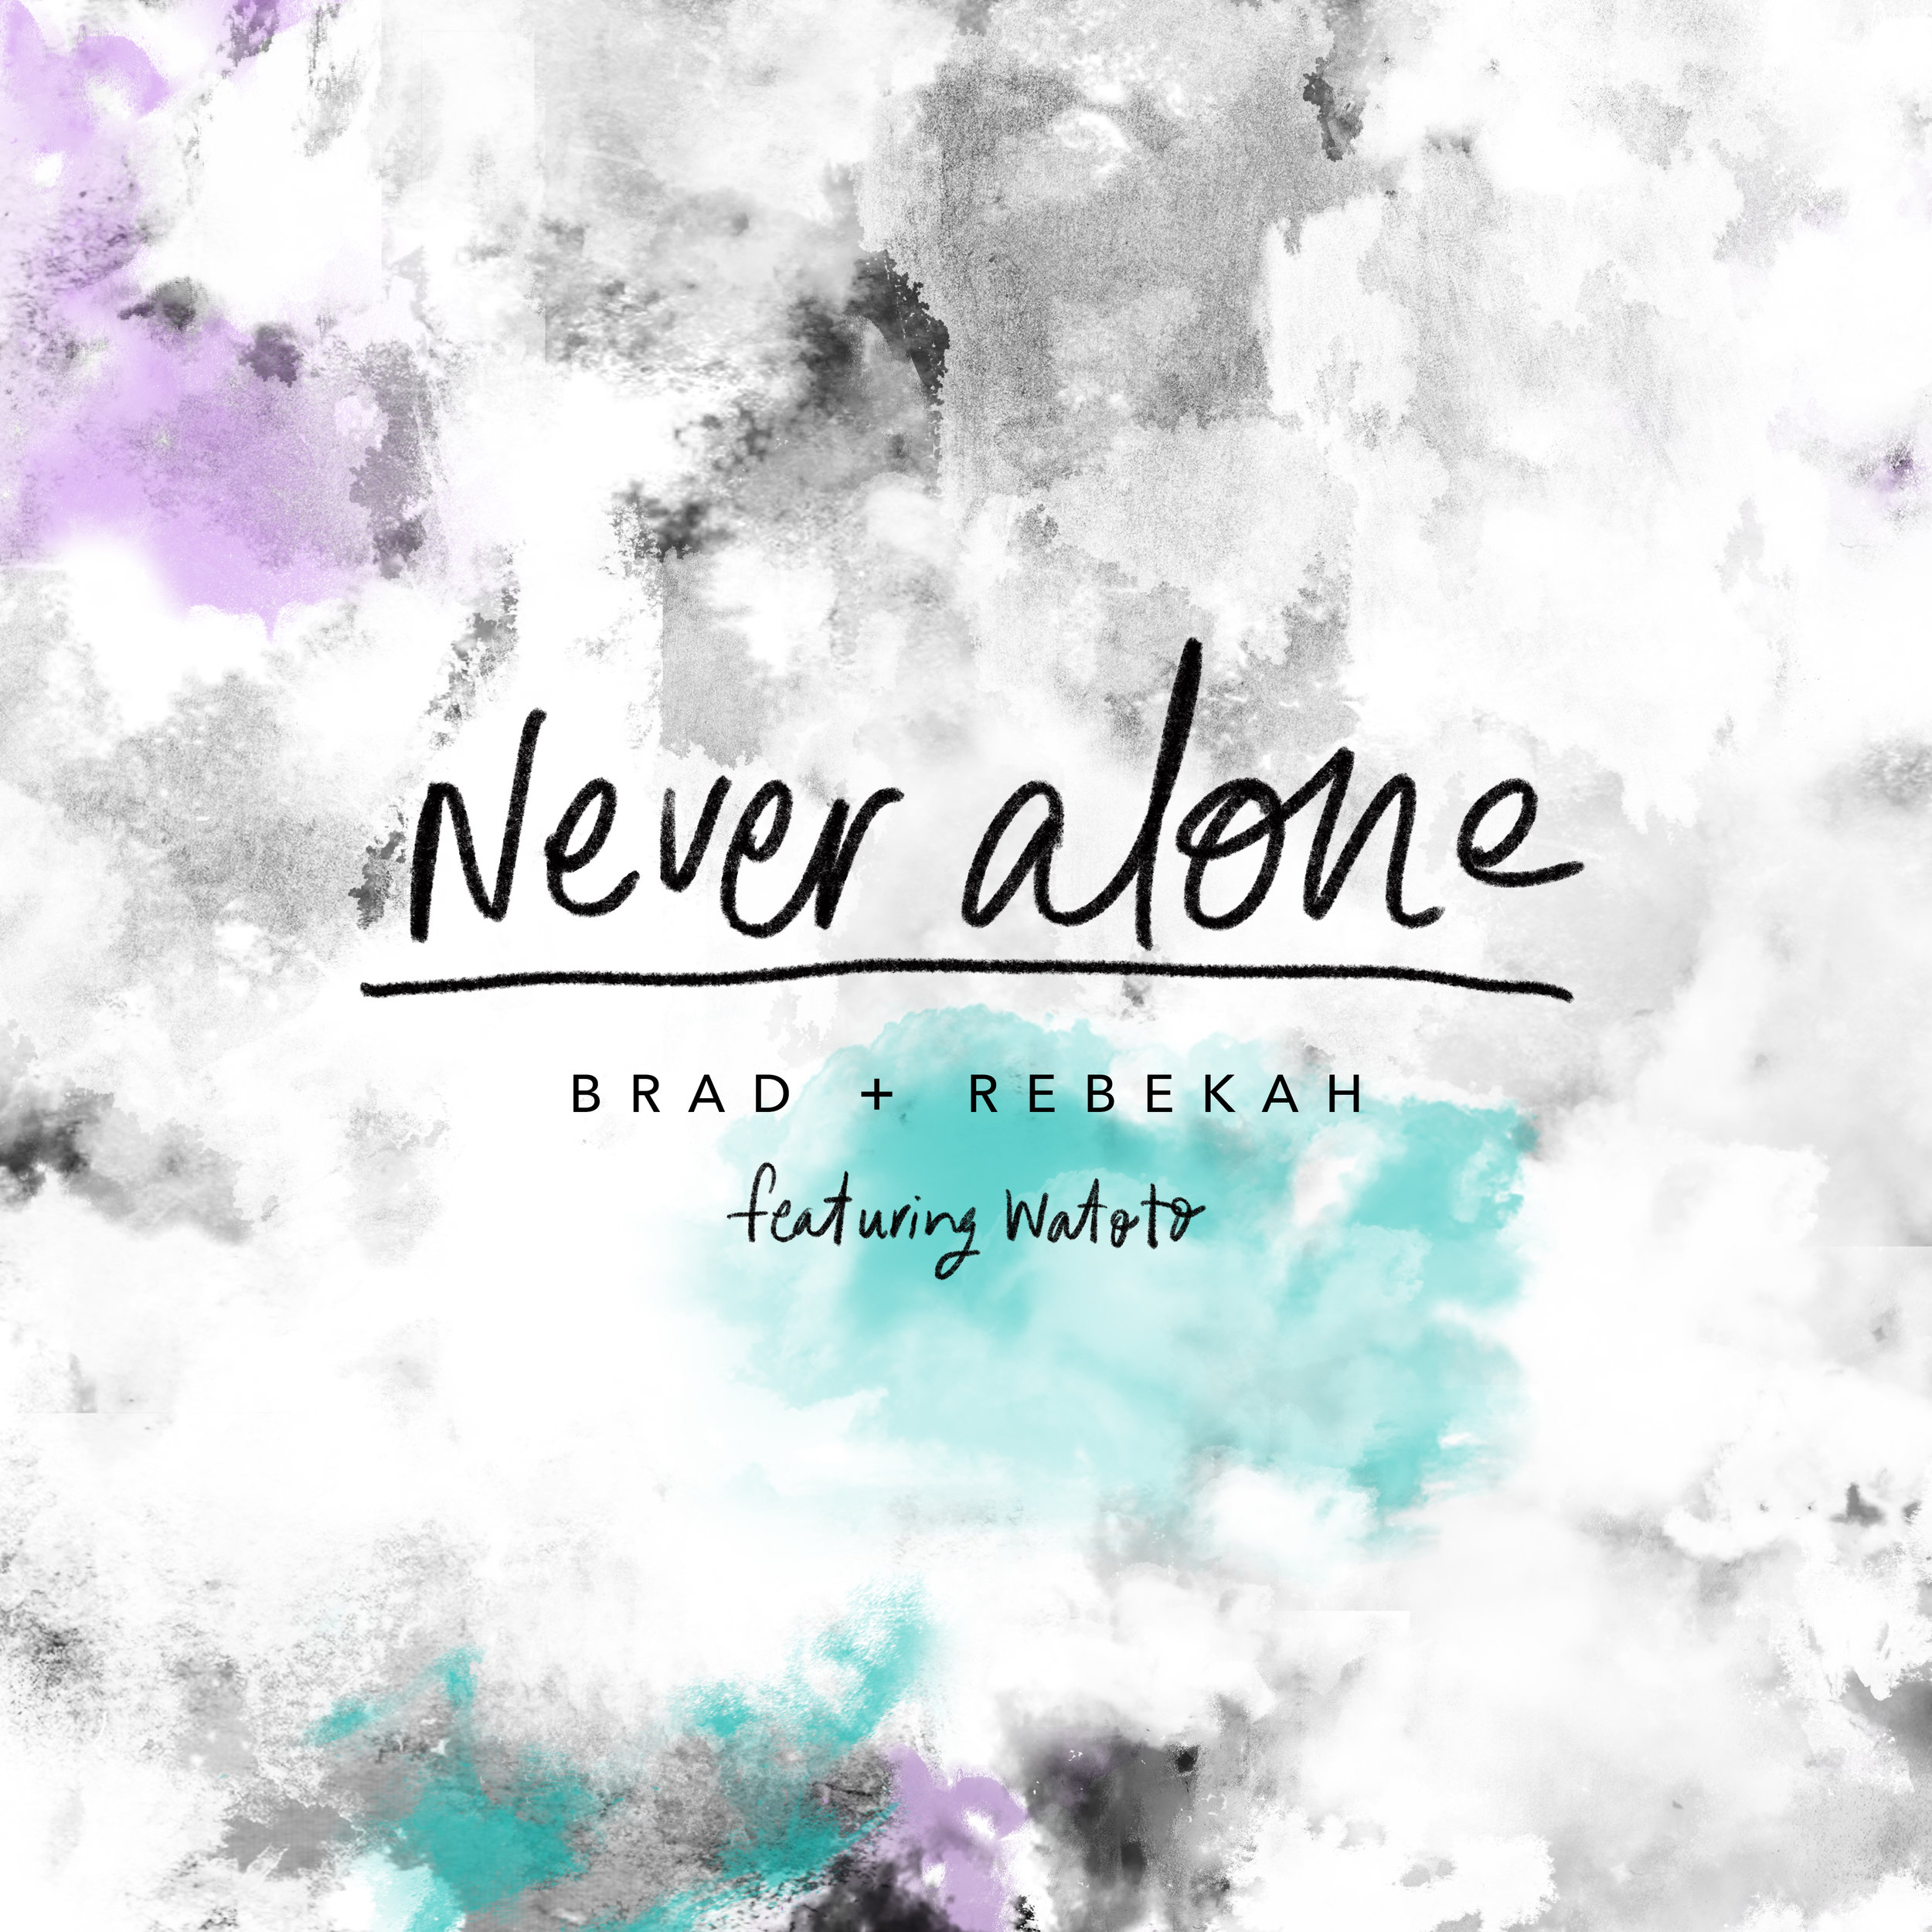 Never Alone - Cover.jpg